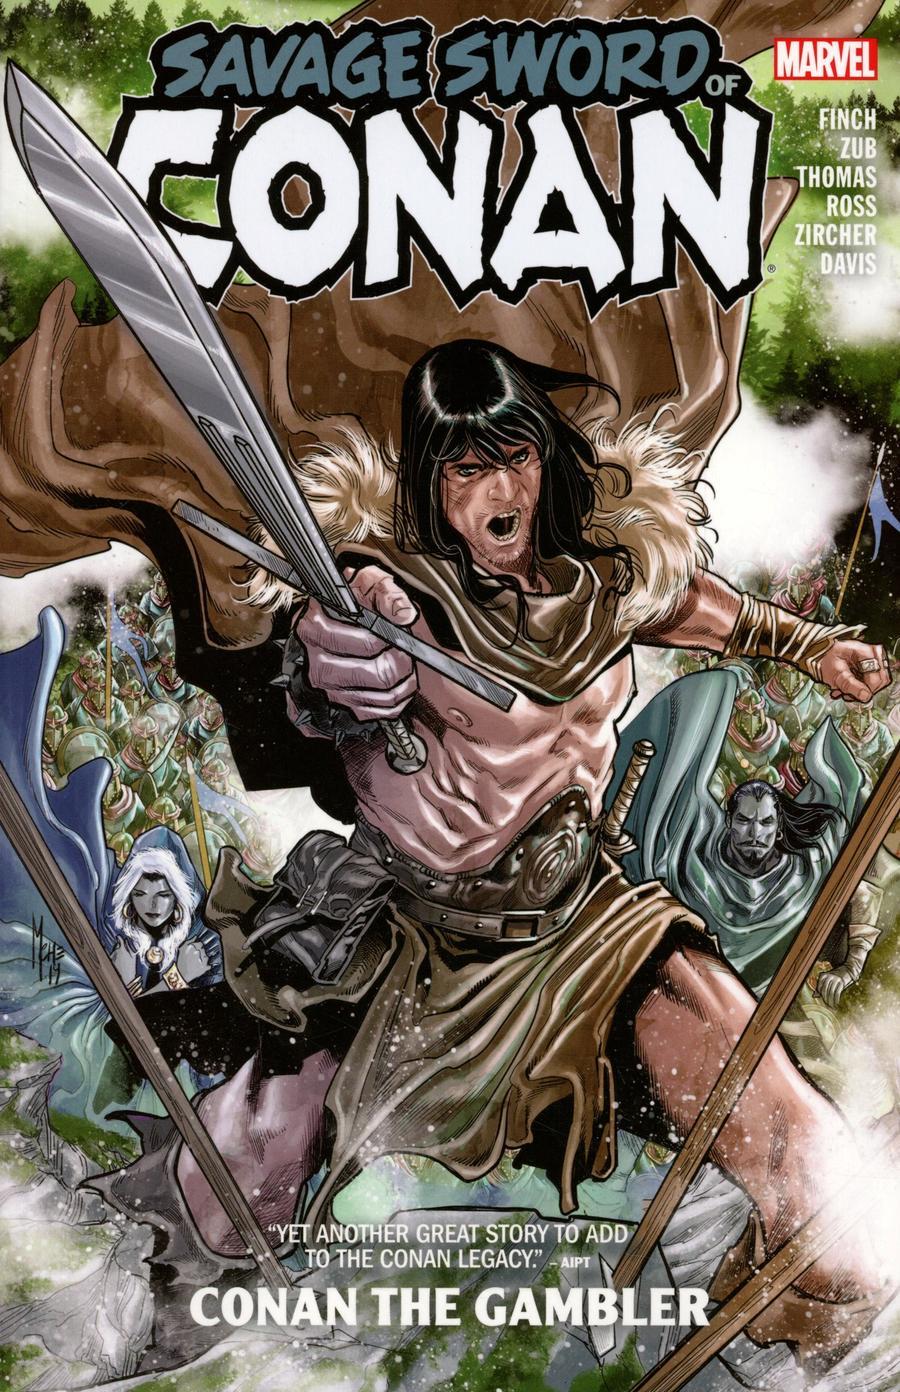 Savage Sword Of Conan Conan The Gambler TP